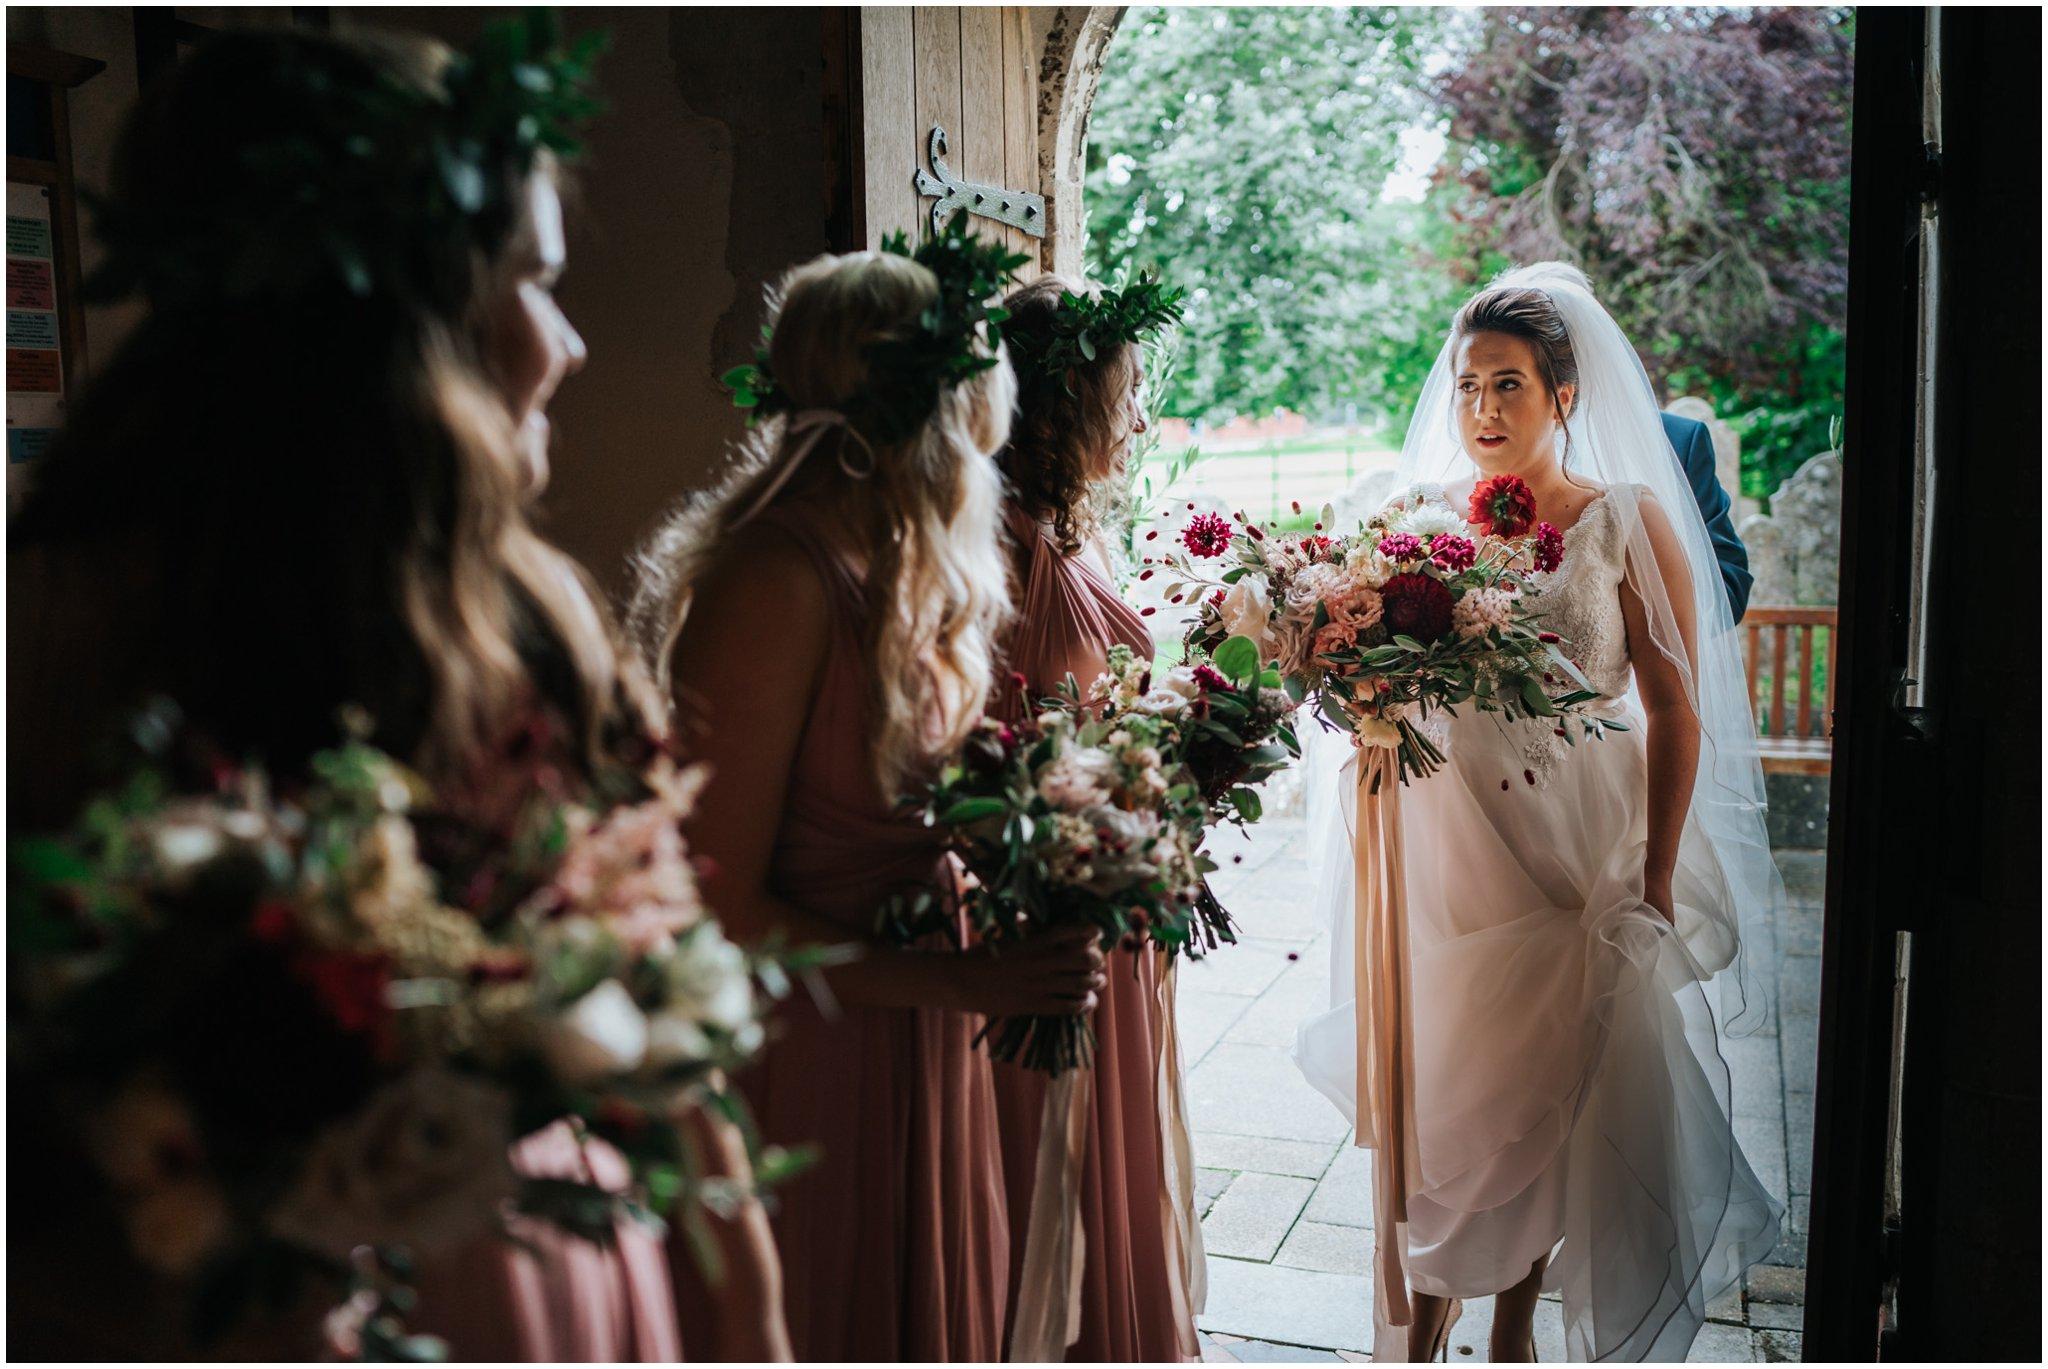 st mary's church kingsworthy wedding